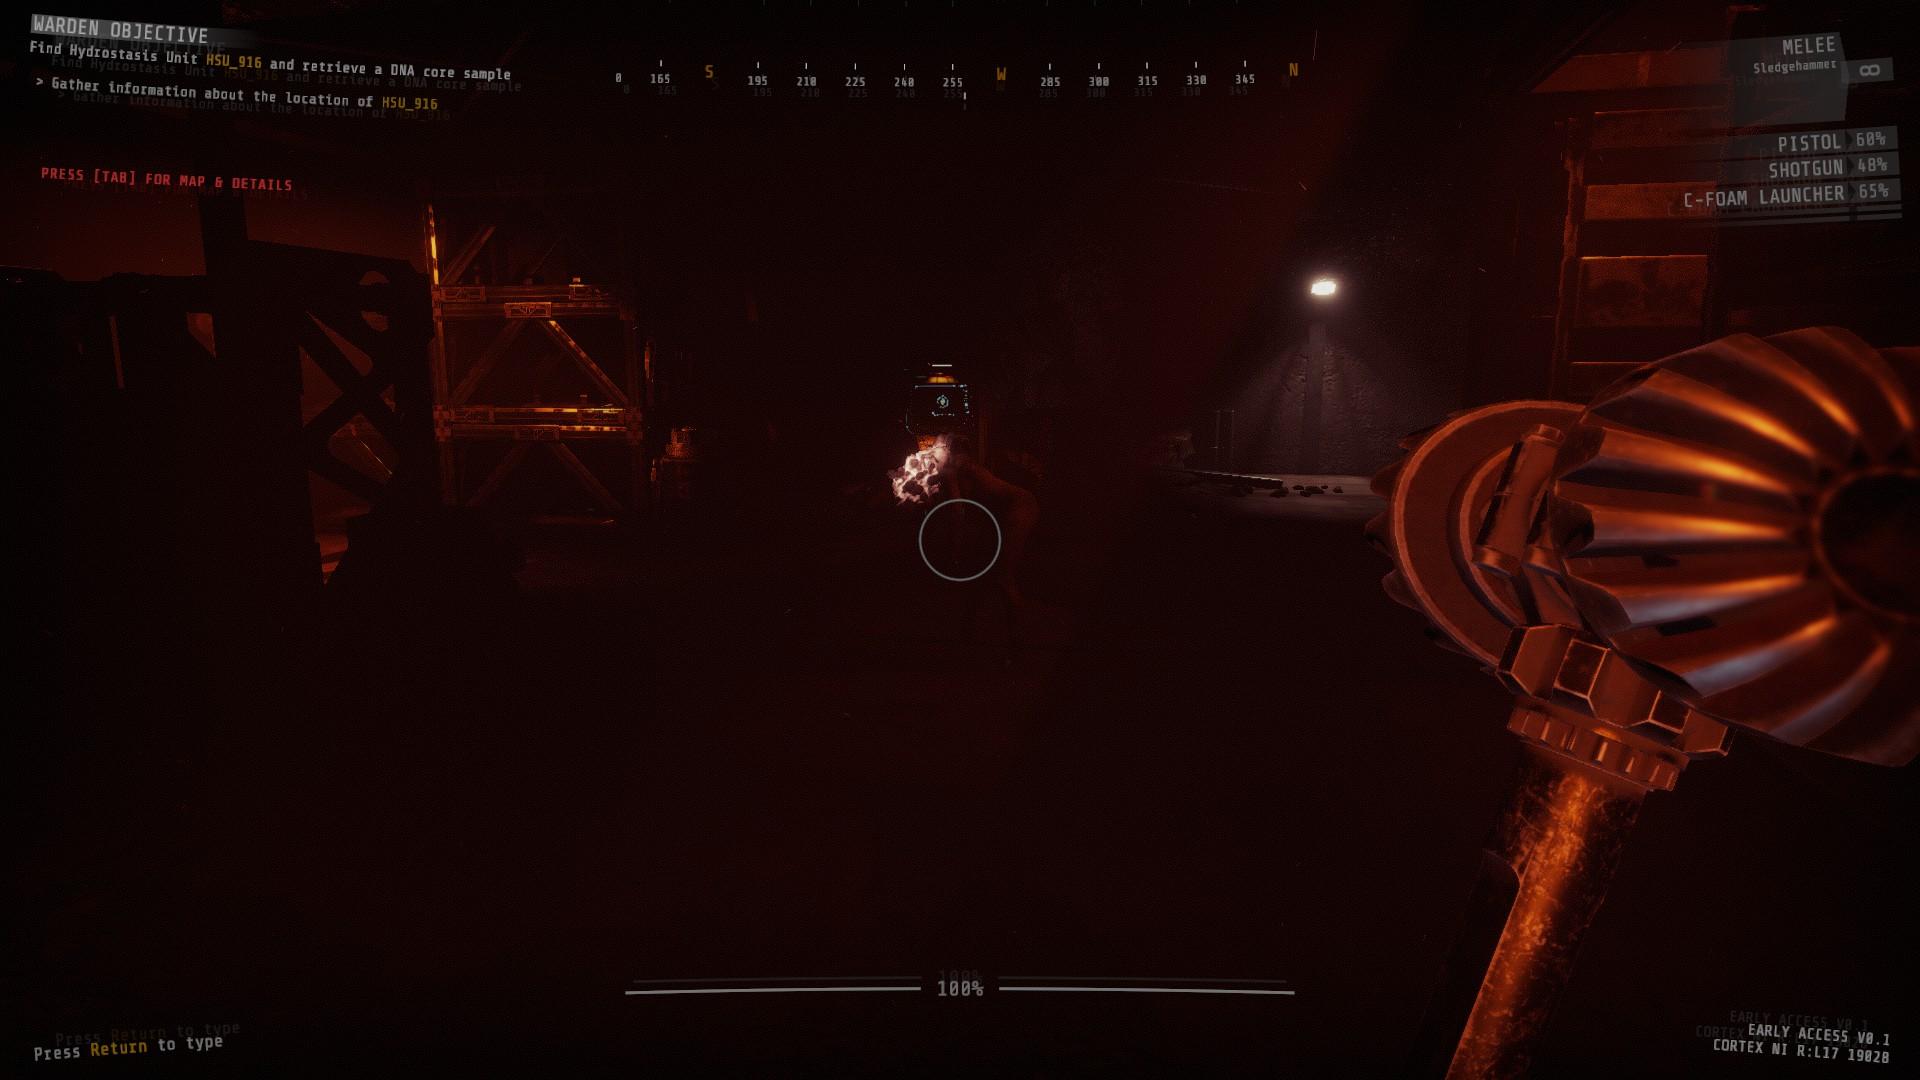 [PCゲーム]GTFO早期アクセス、そうだ、地下施設を調べにいこう。4